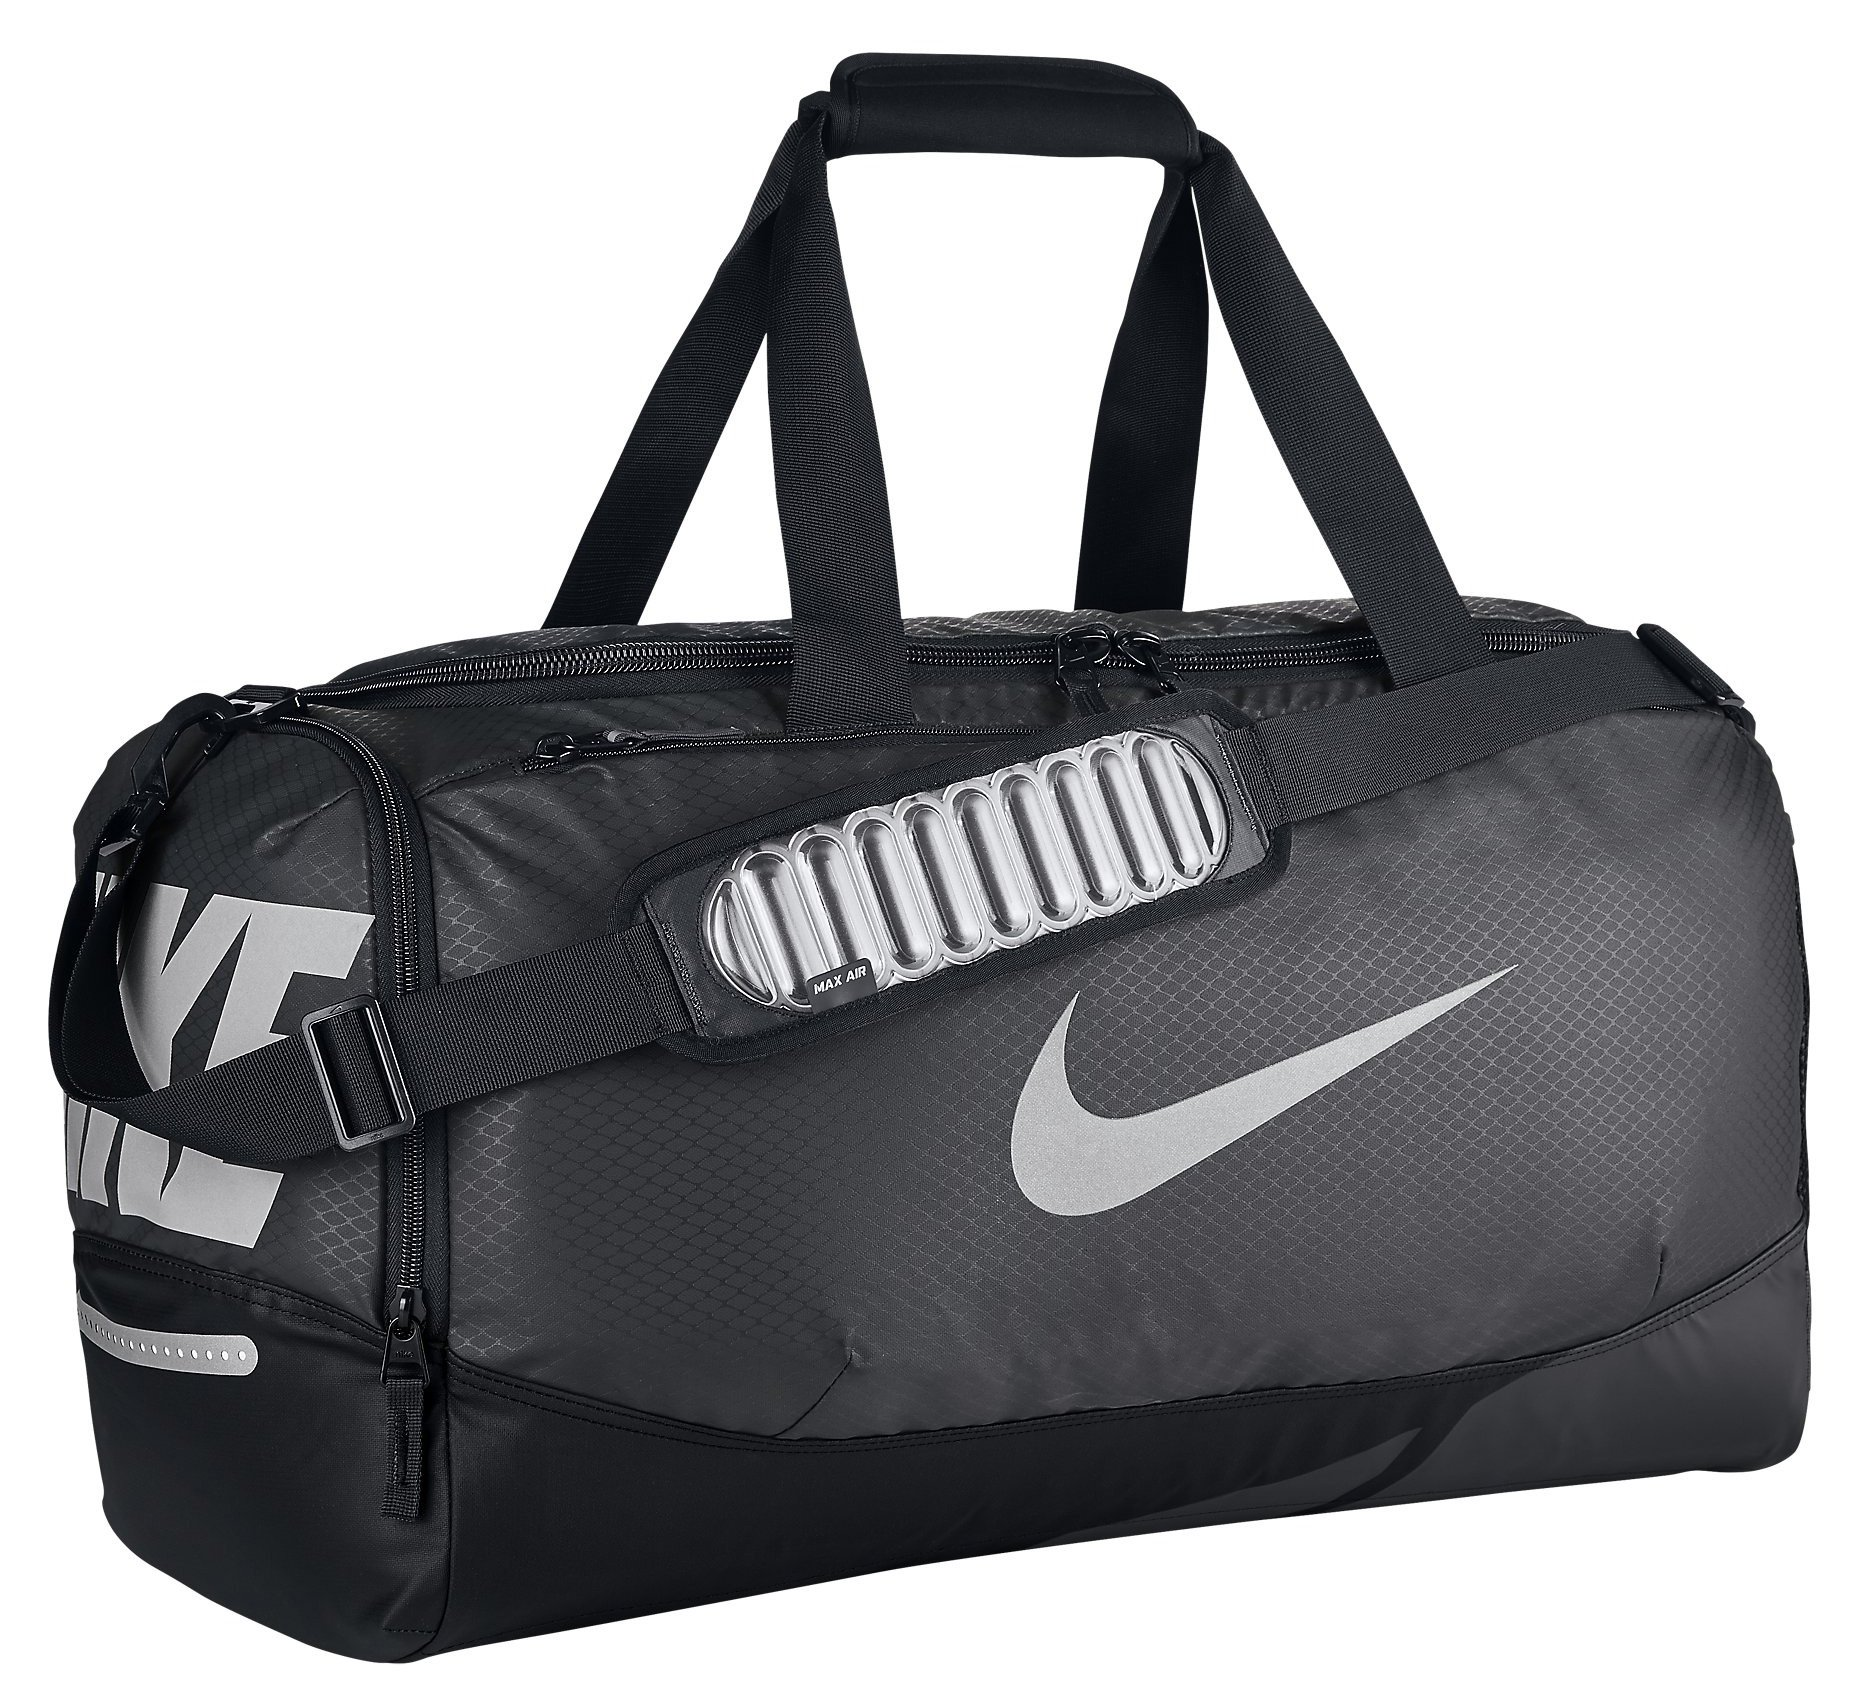 Taška Nike MAX Air Vapor